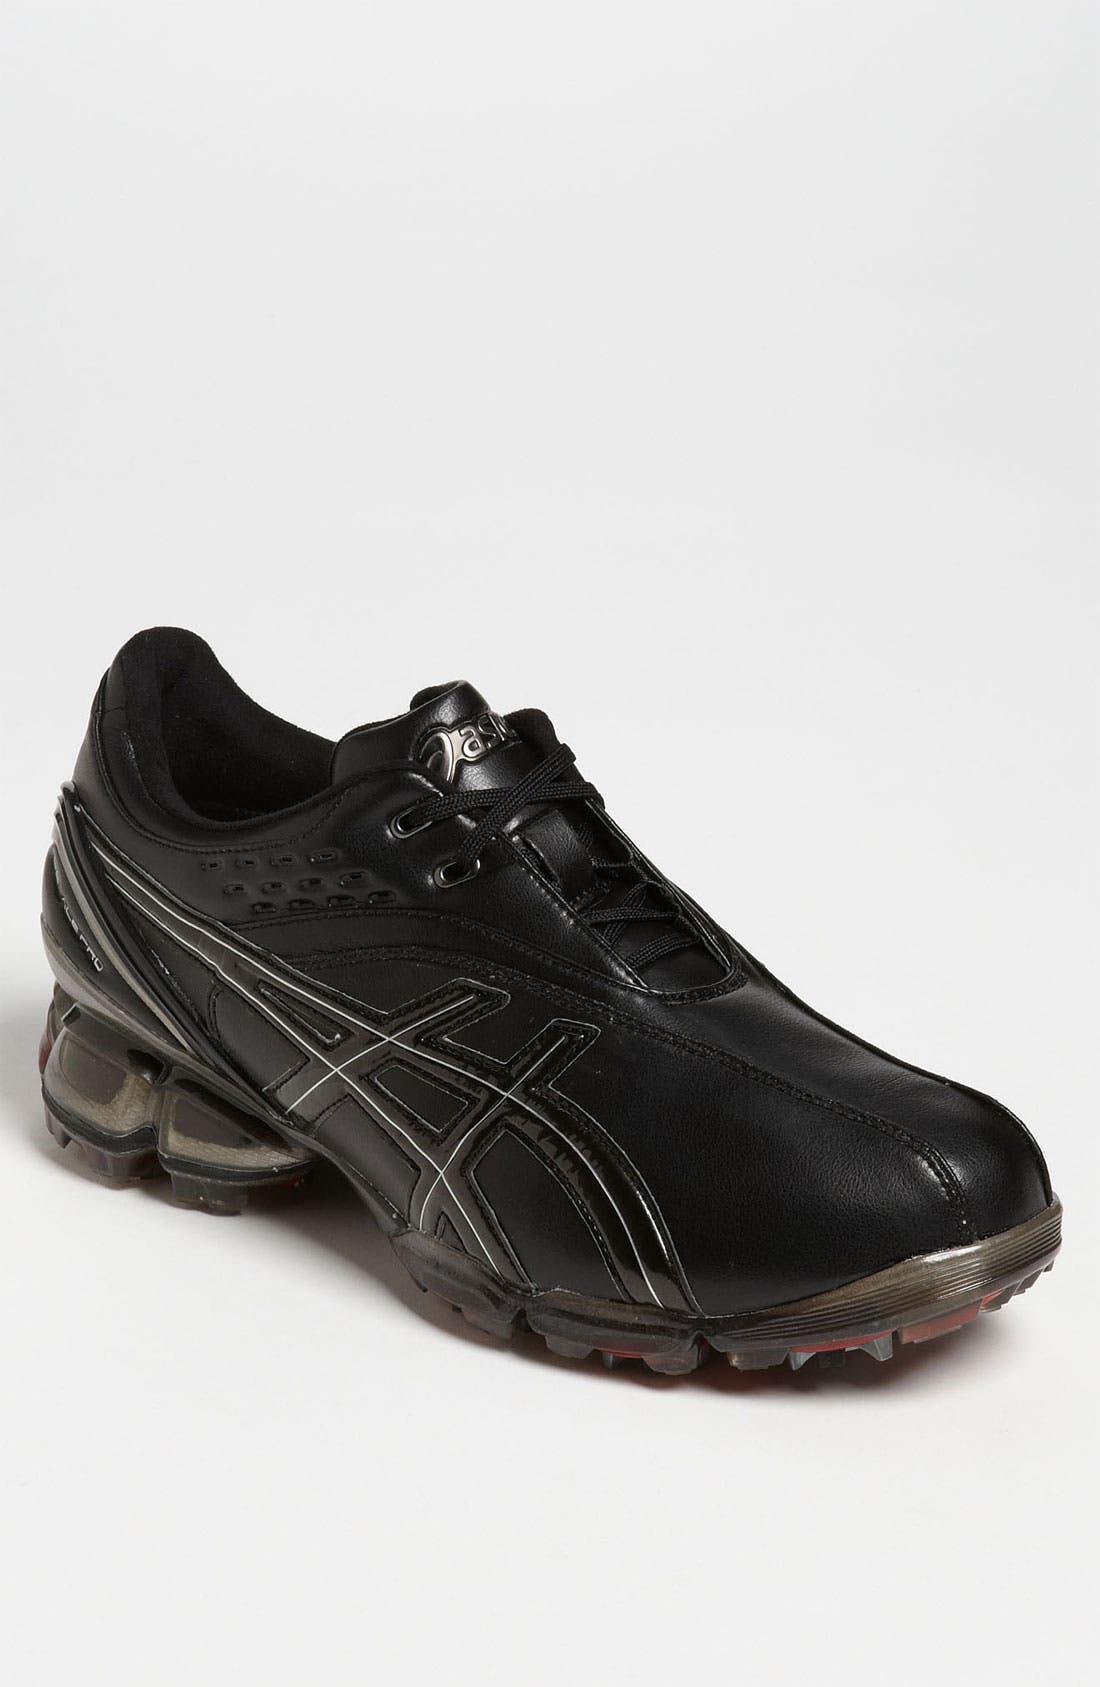 Alternate Image 1 Selected - ASICS® 'GEL-Ace Pro' Golf Shoe (Men)